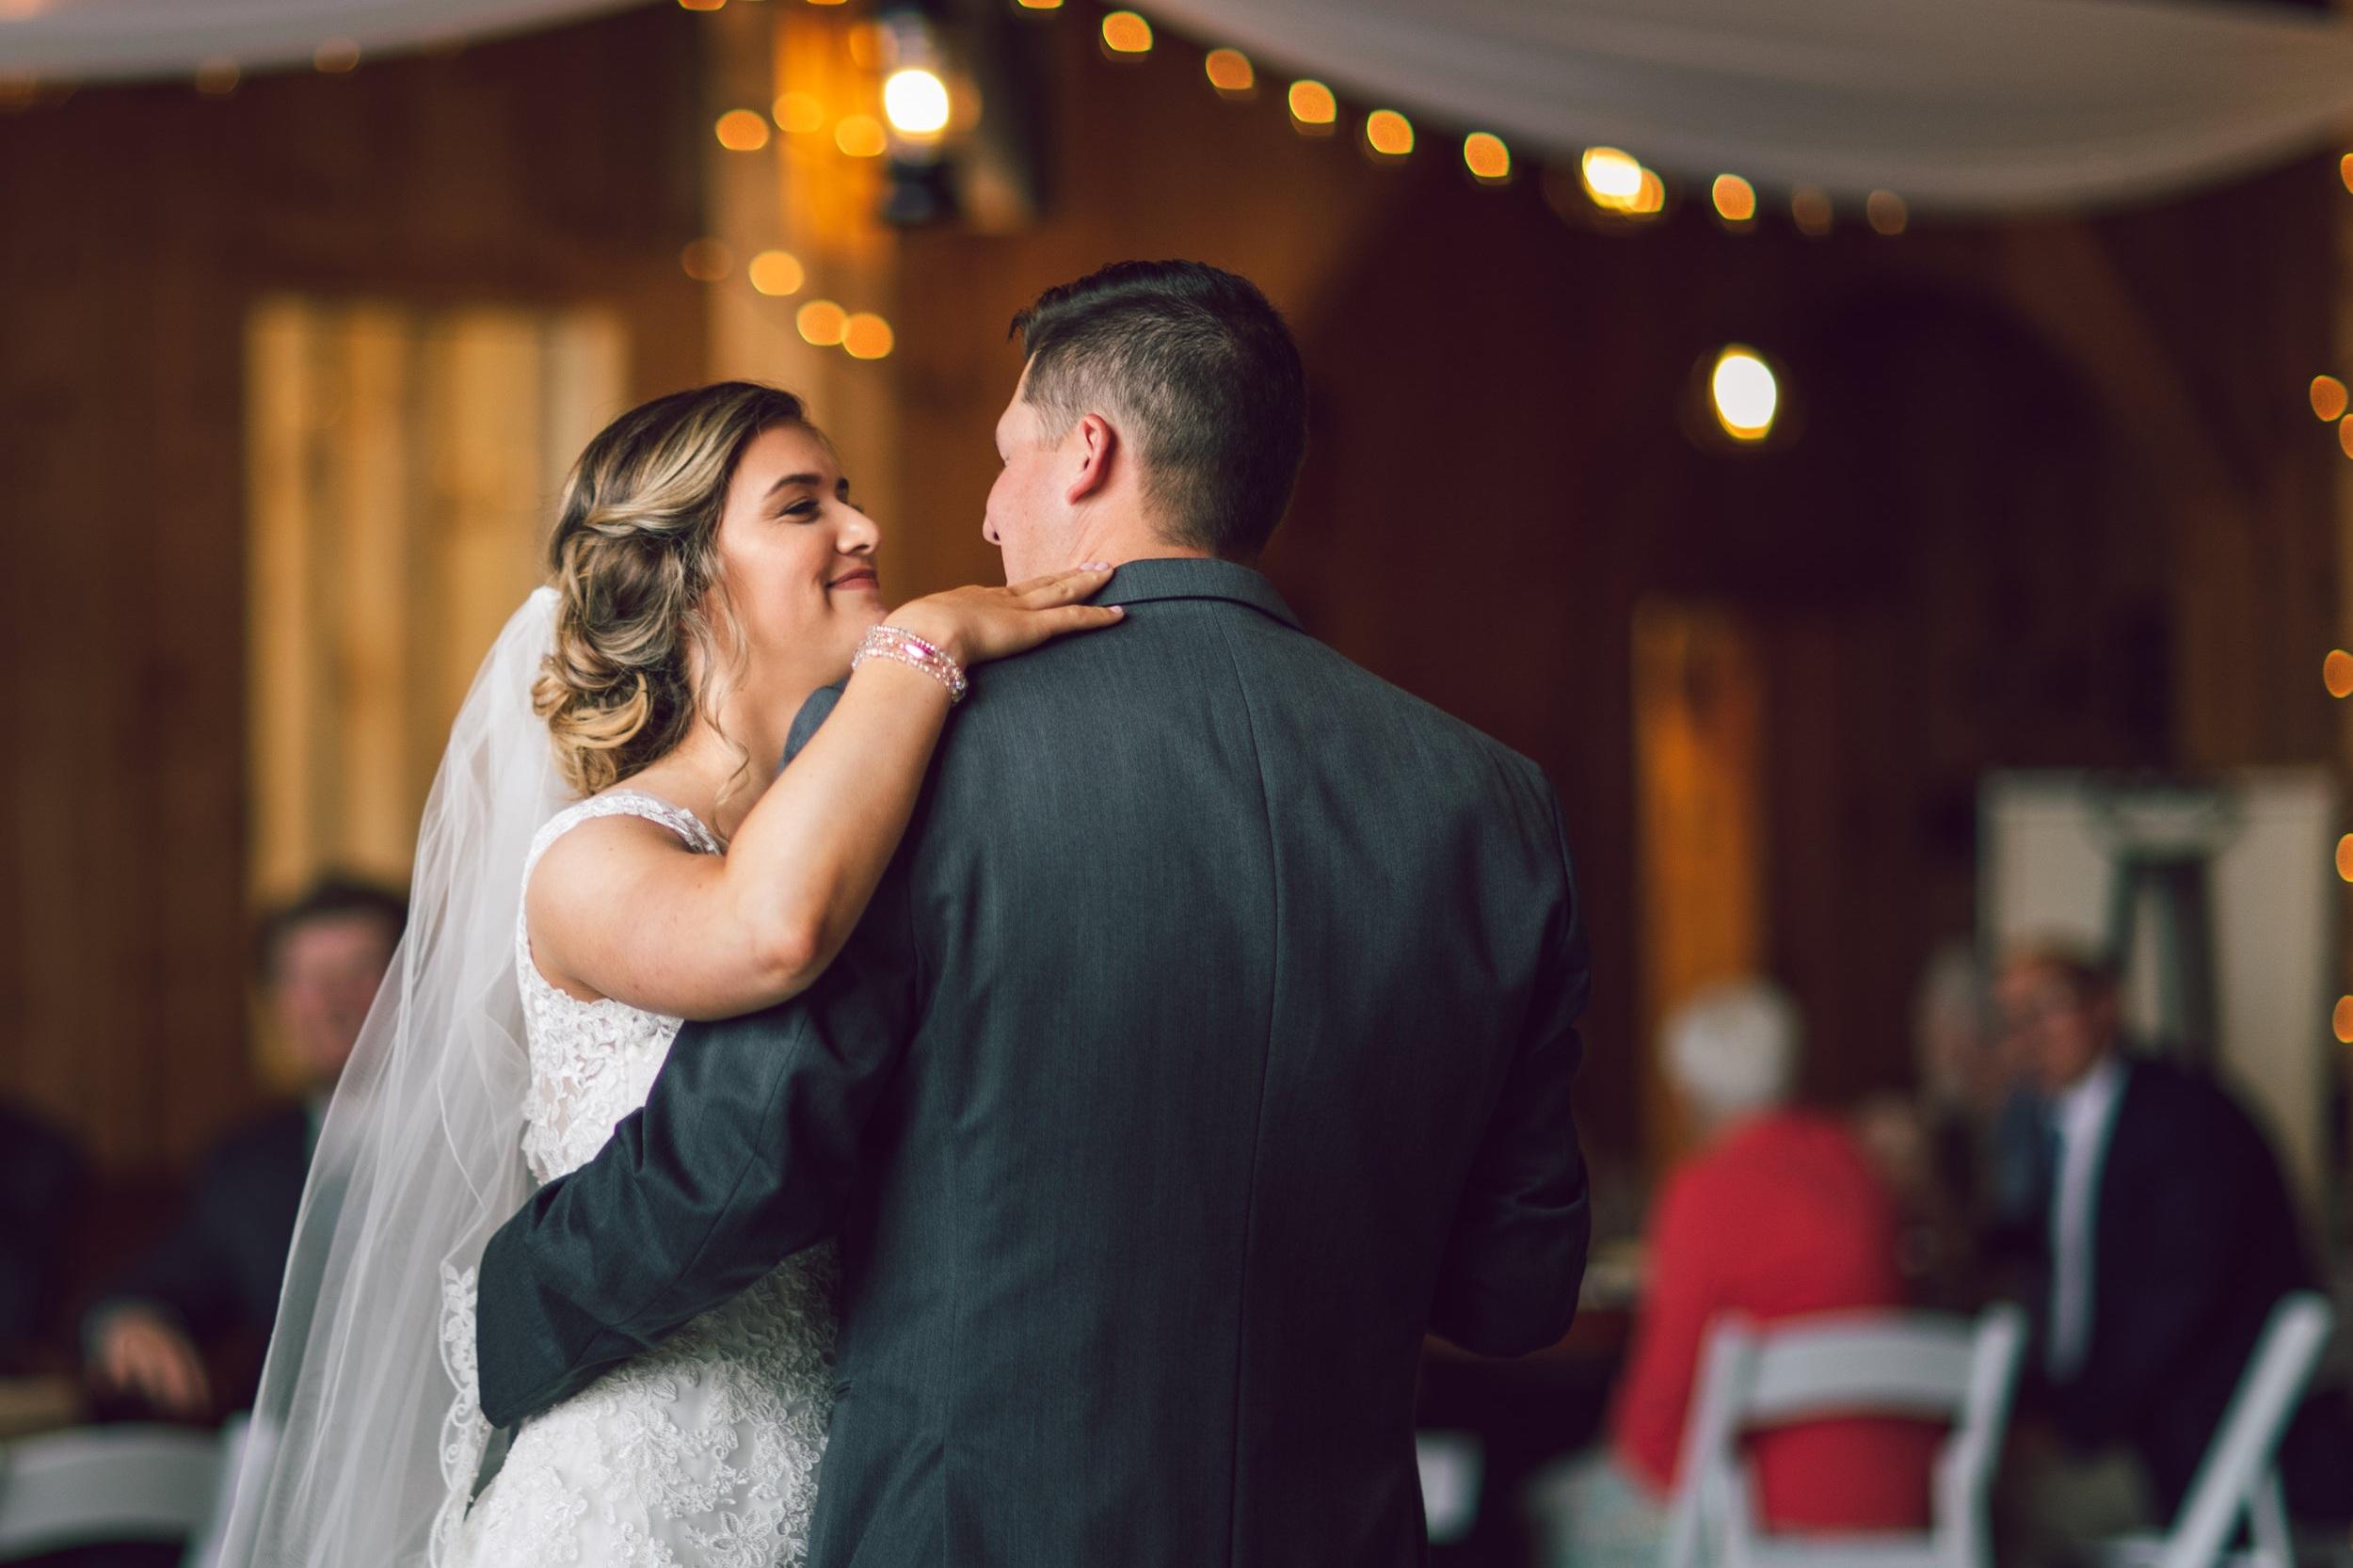 randi-schuette-photo-the-barn-at-heritage-farm-nc-wedding-edwards-reception20.jpg